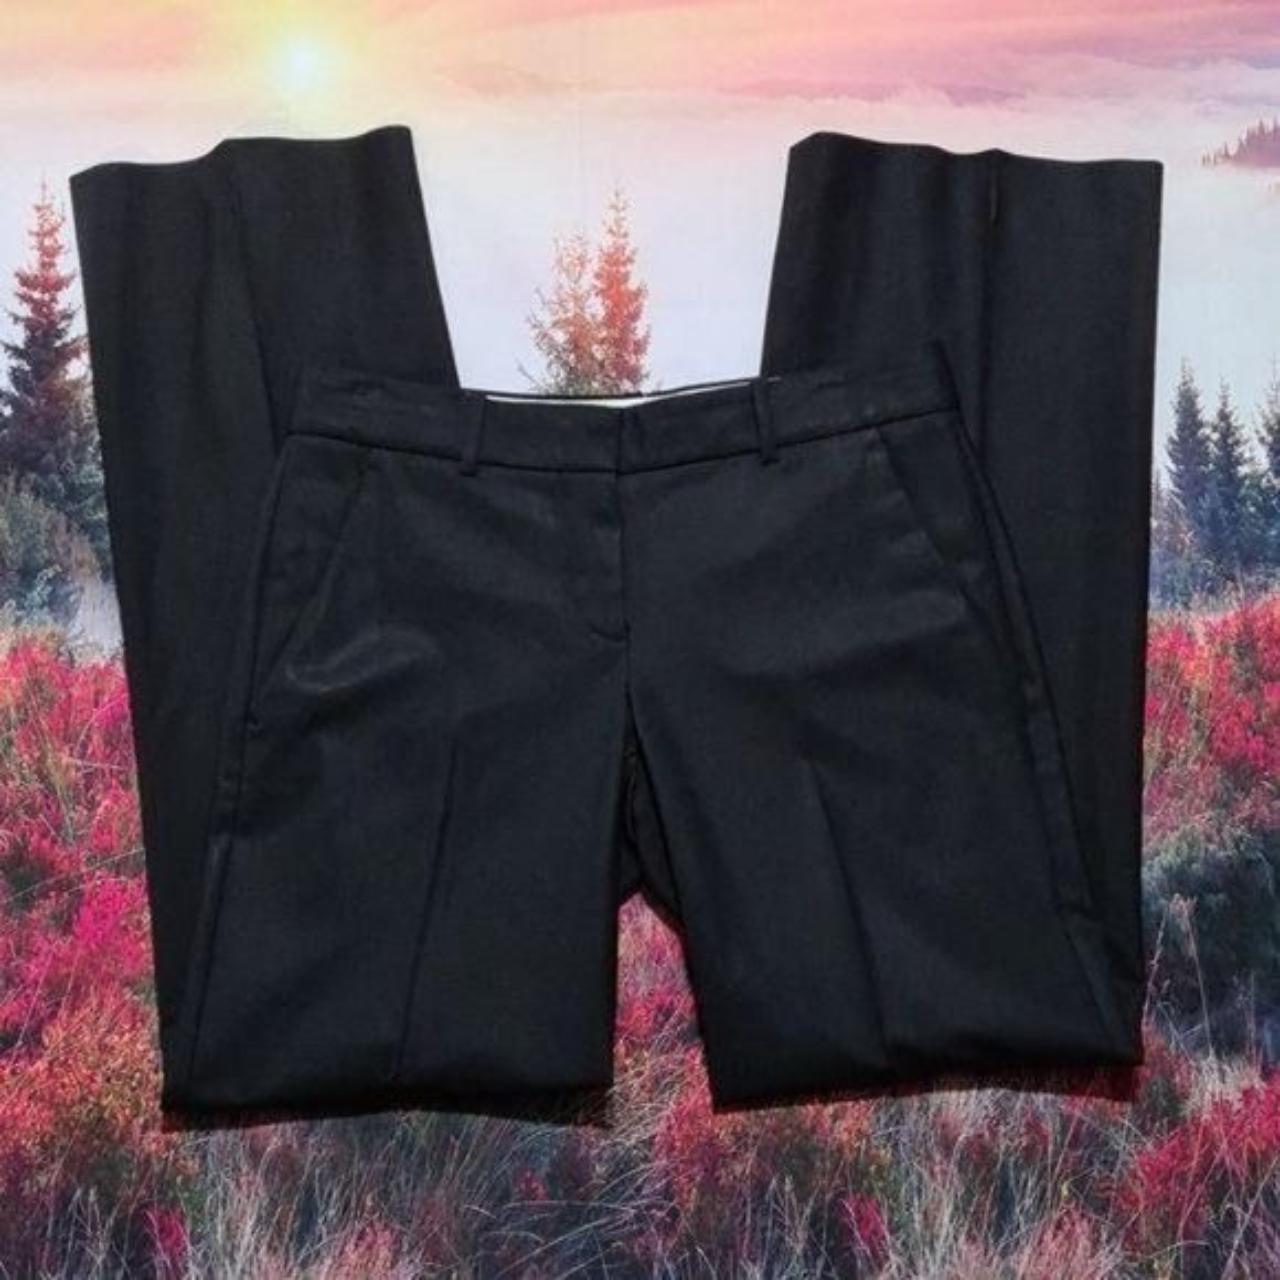 Product Image 1 - THEORY Pleated Black Dress Pants